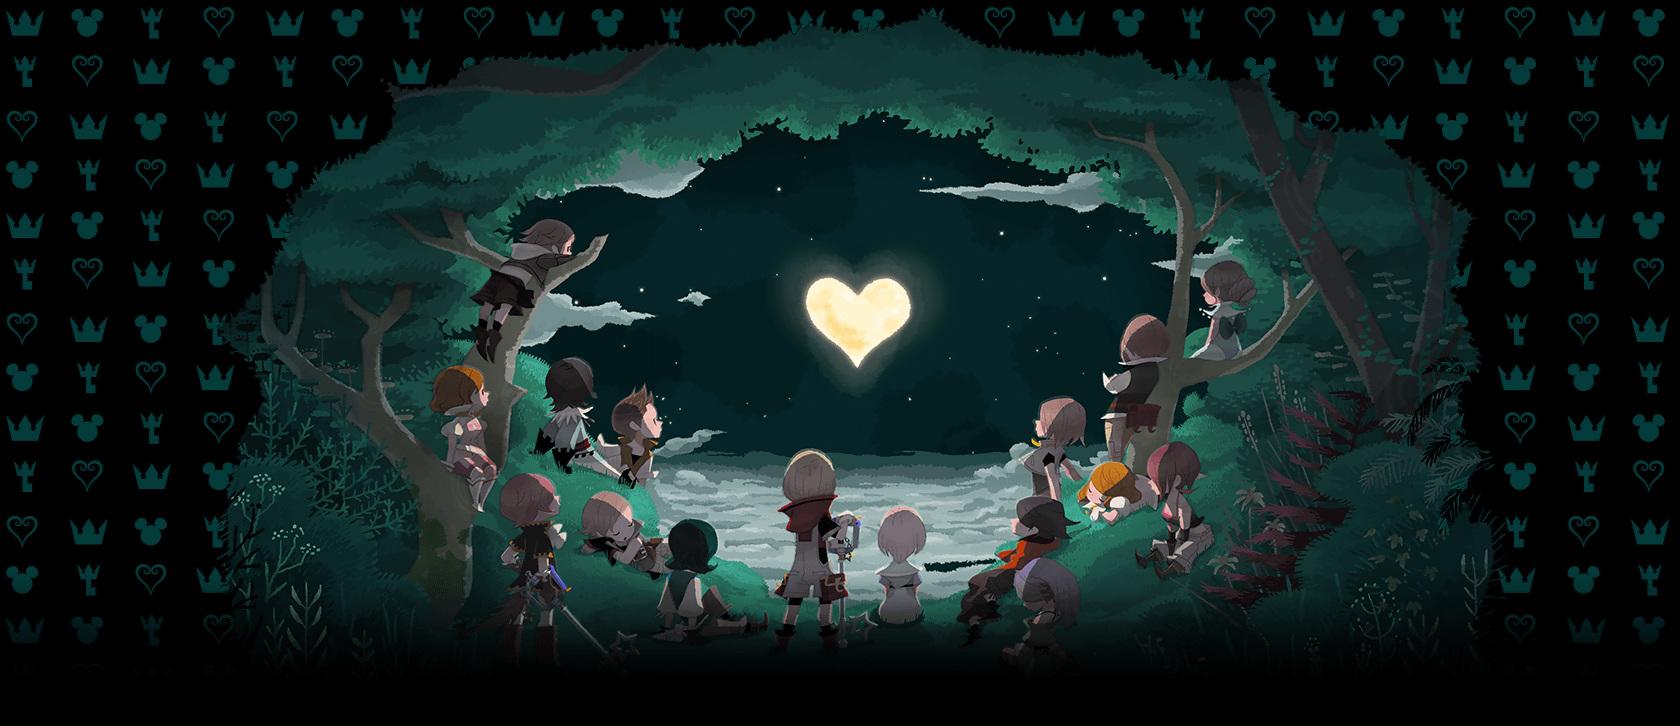 ~♥  •  KINGDOM HEARTS  •  ♥~ - Page 4 080713-kh-x-chi-artwork